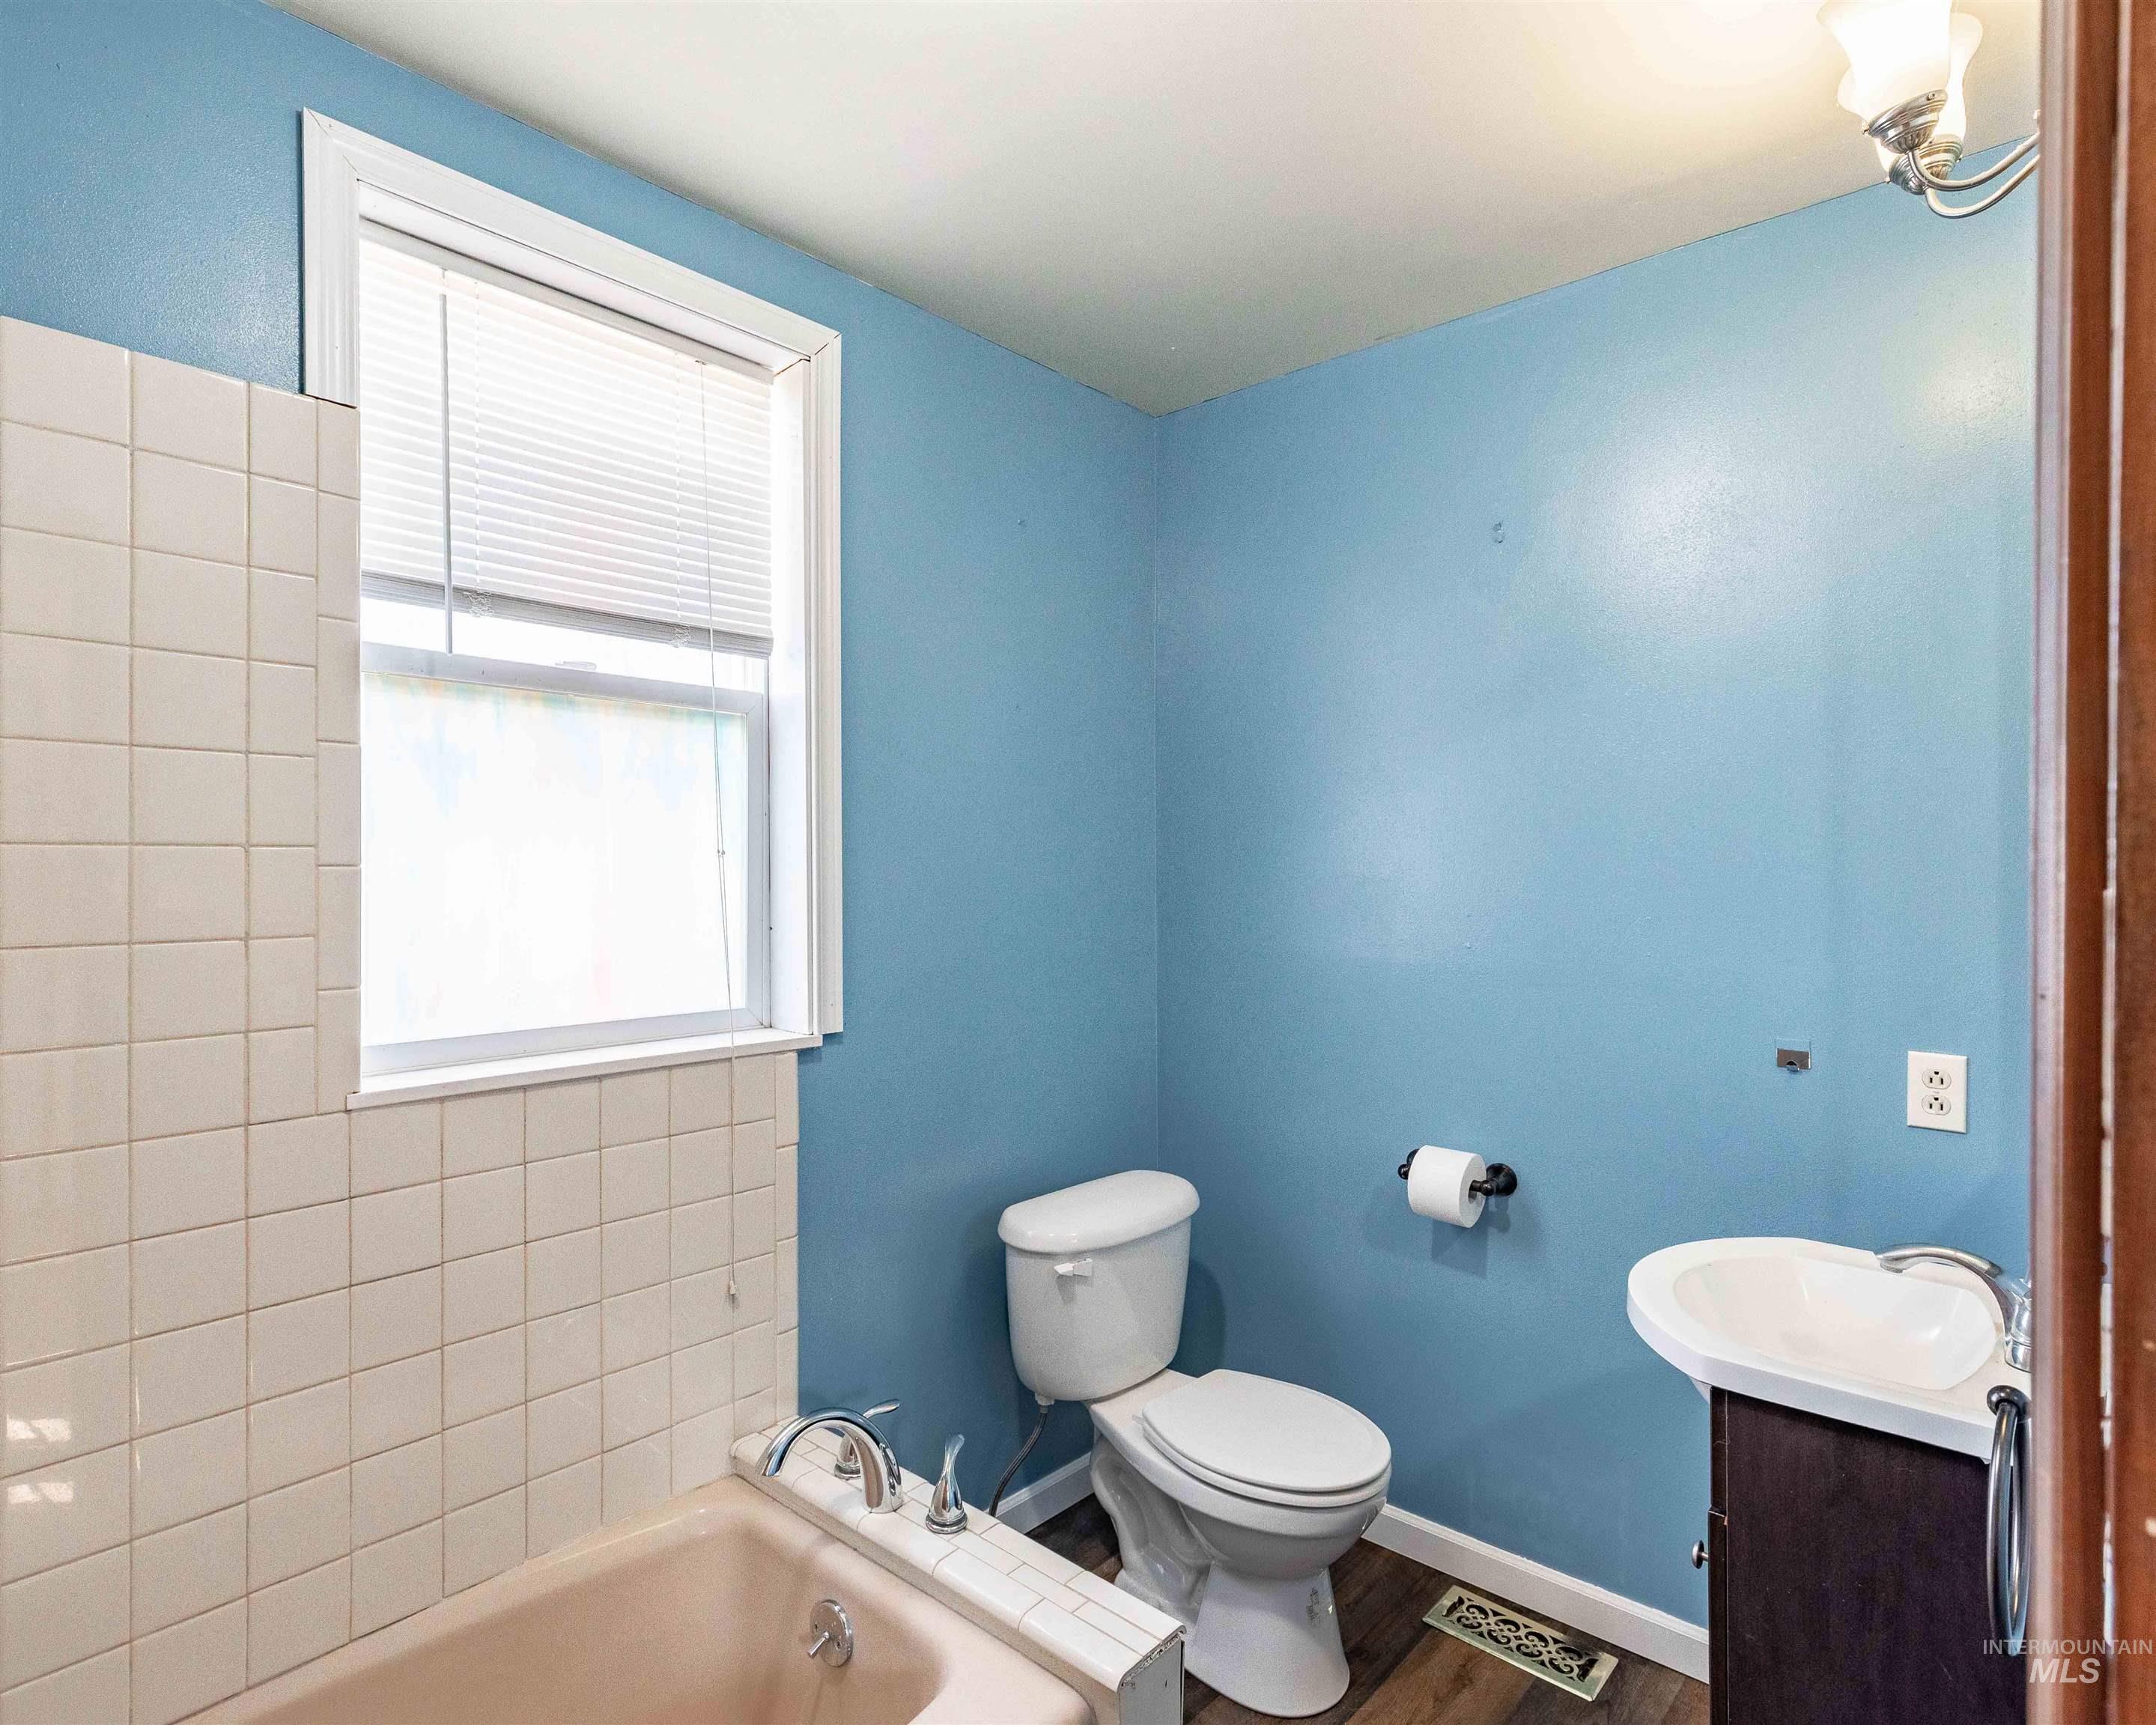 346 N Jackson Property Photo 20